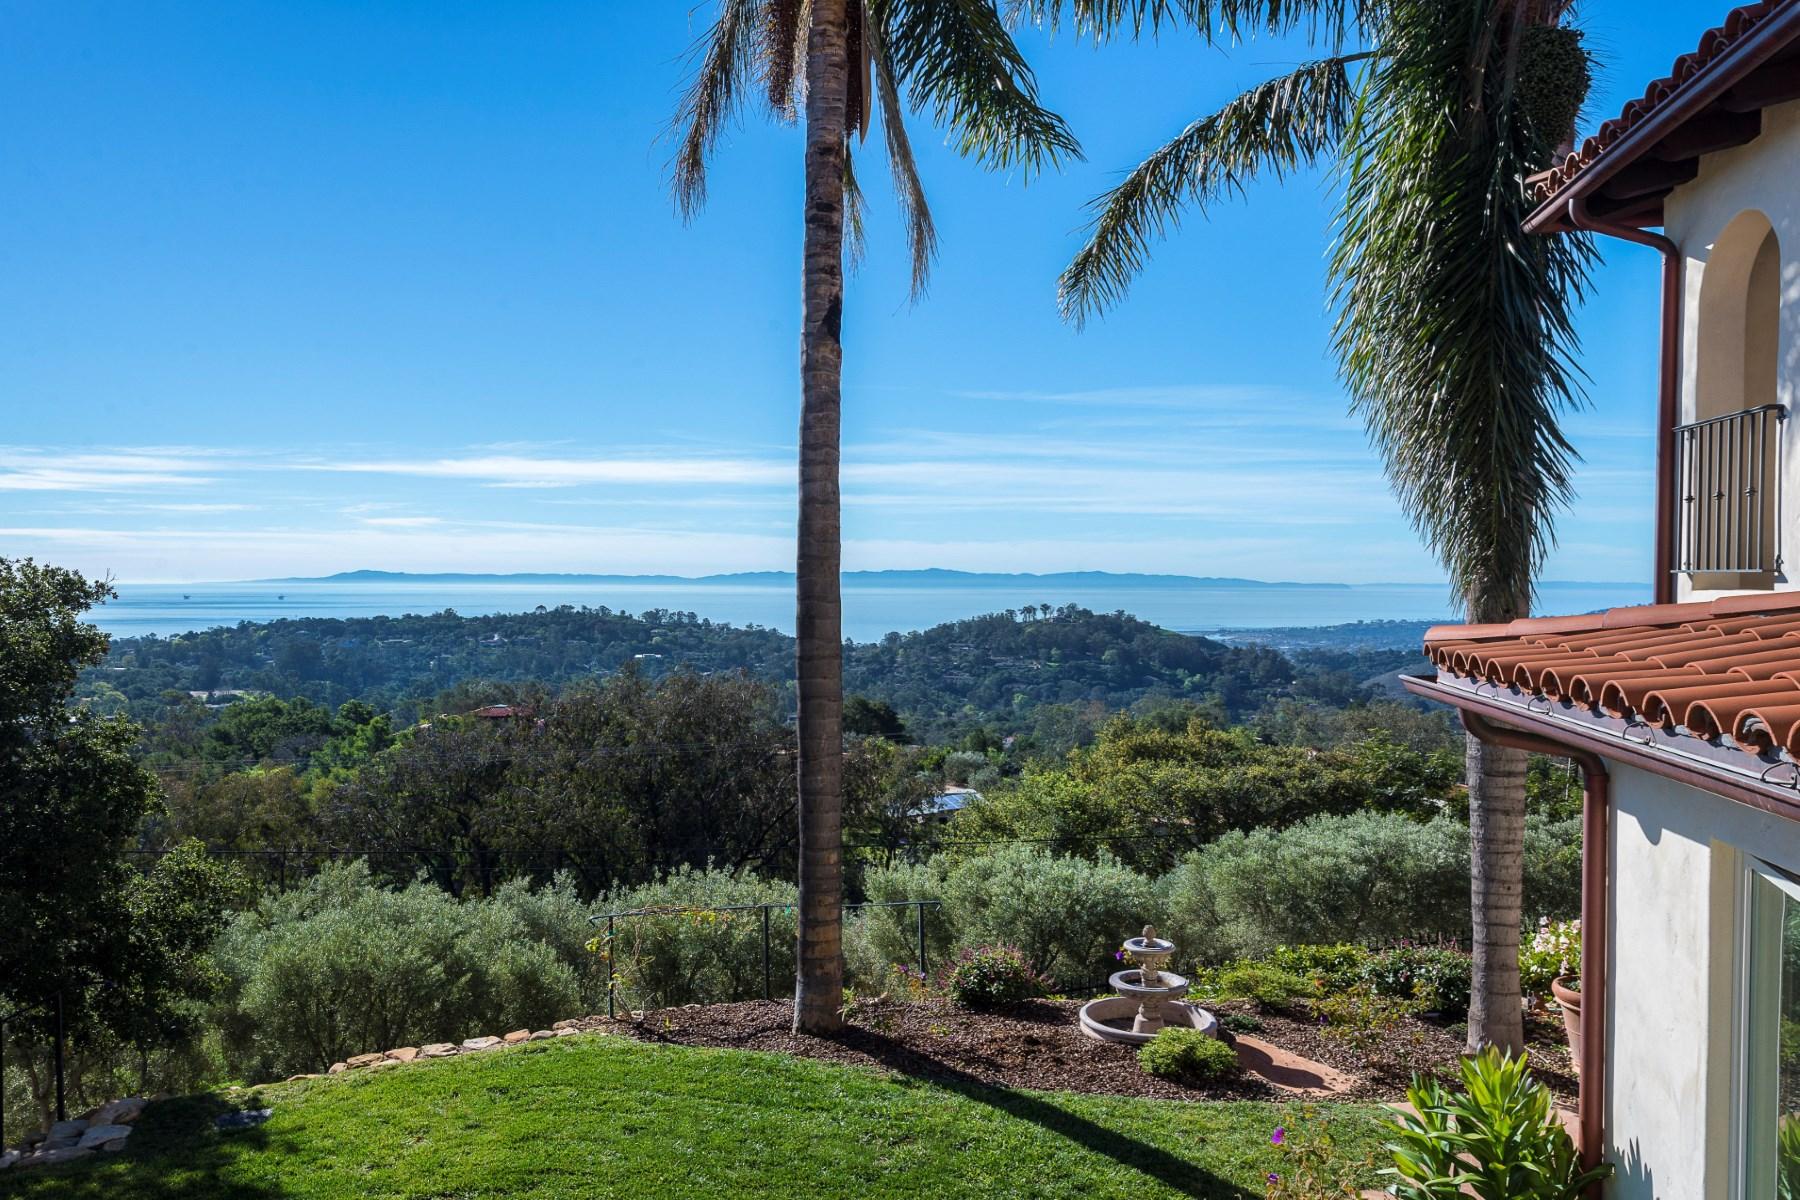 Single Family Home for Sale at Montecito Ocean View Paradise 298 East Mountain Drive Montecito - Upper Village, Santa Barbara, California 93108 United States